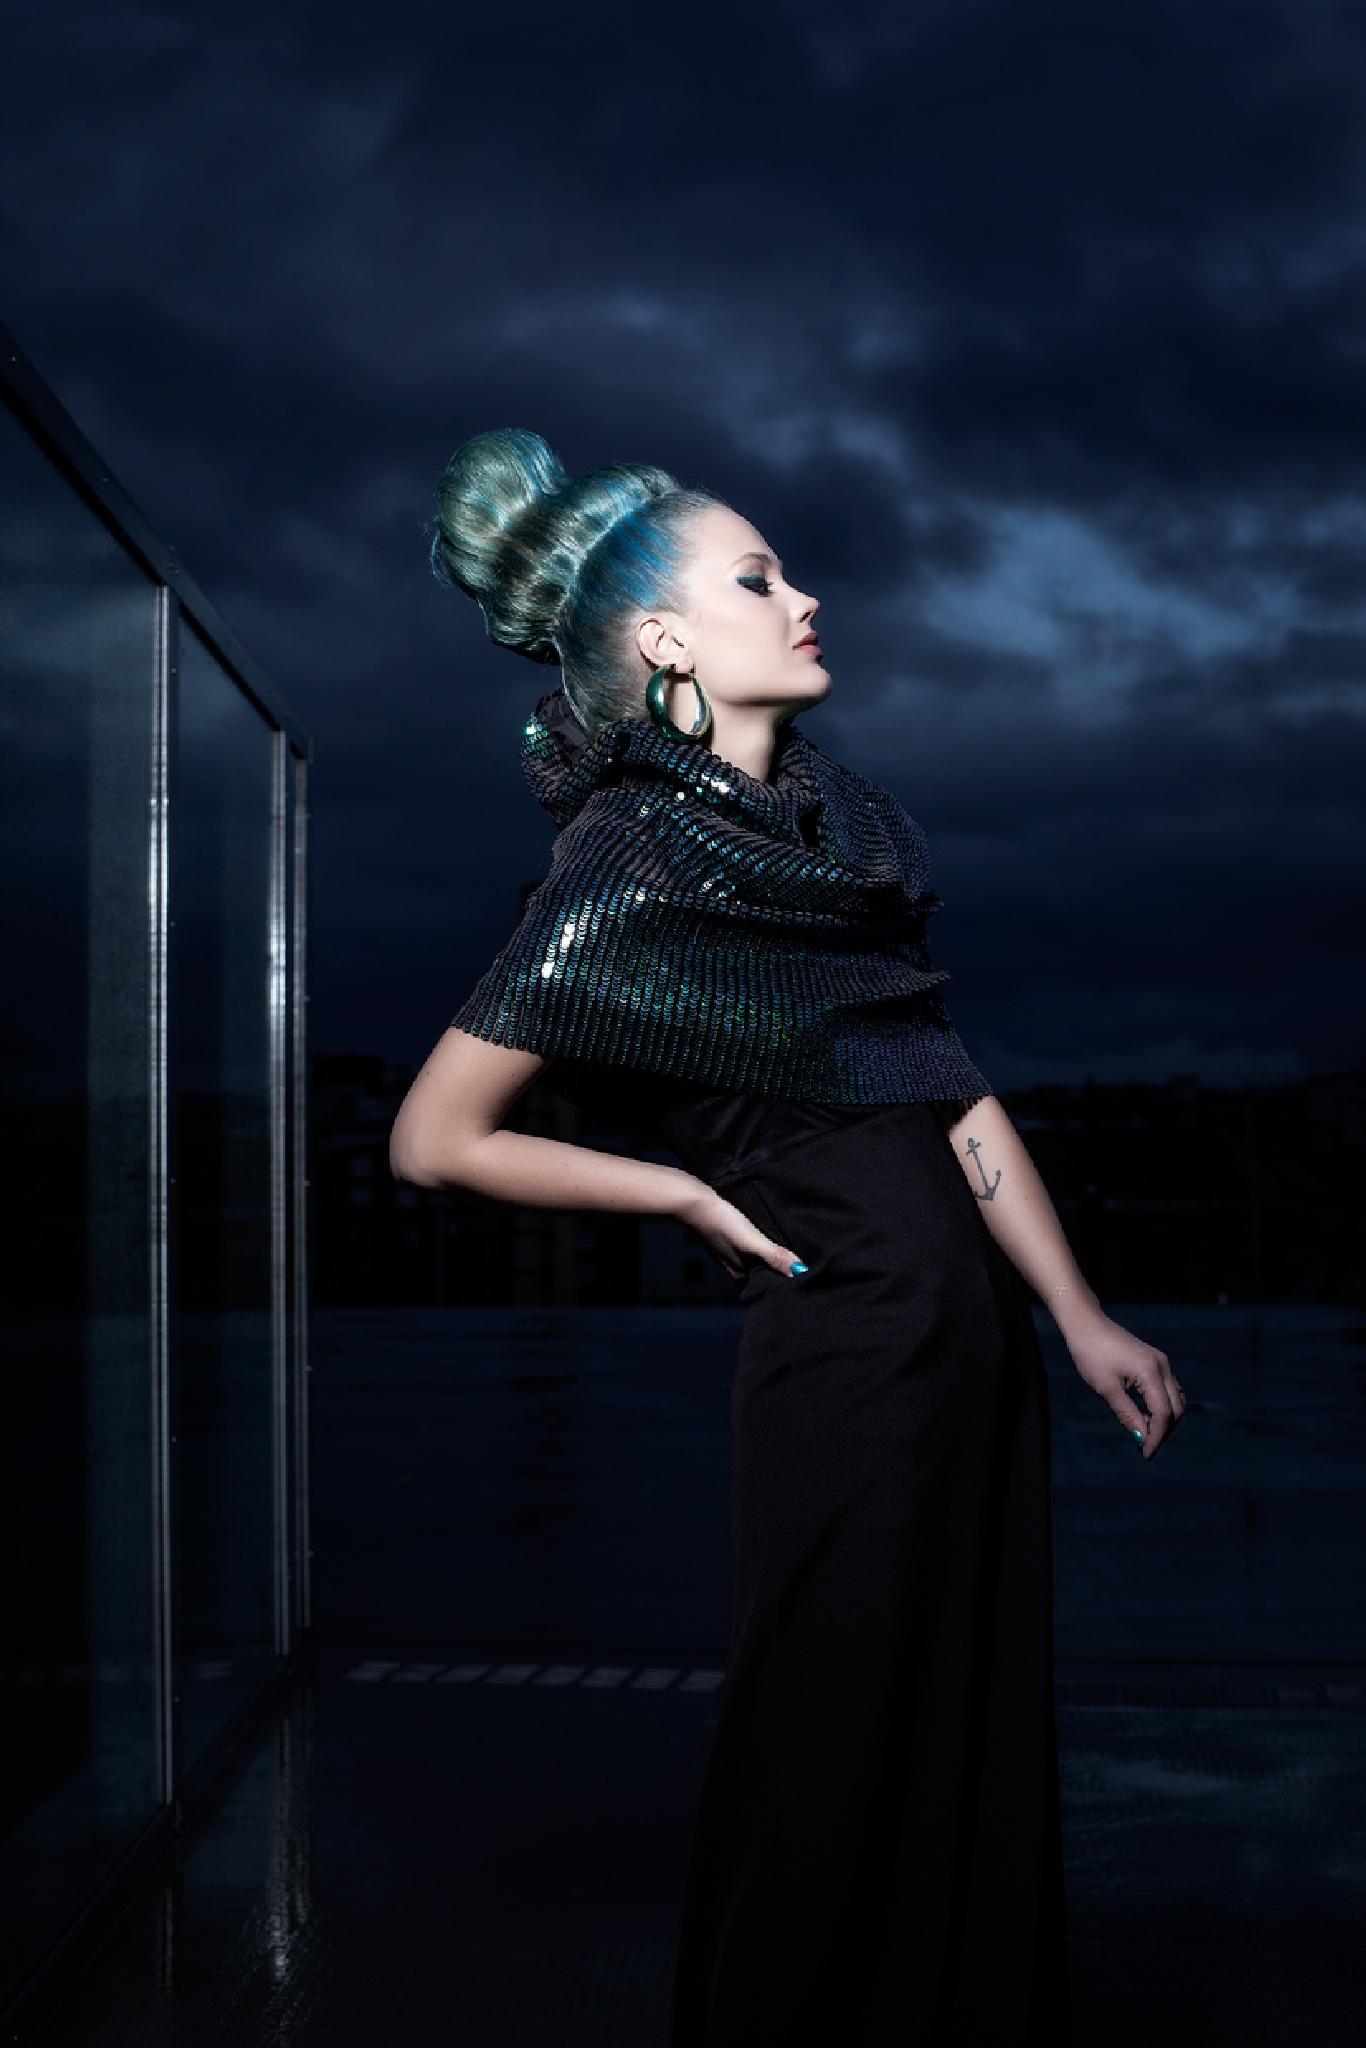 Queen Hair  by John Andre Aasen